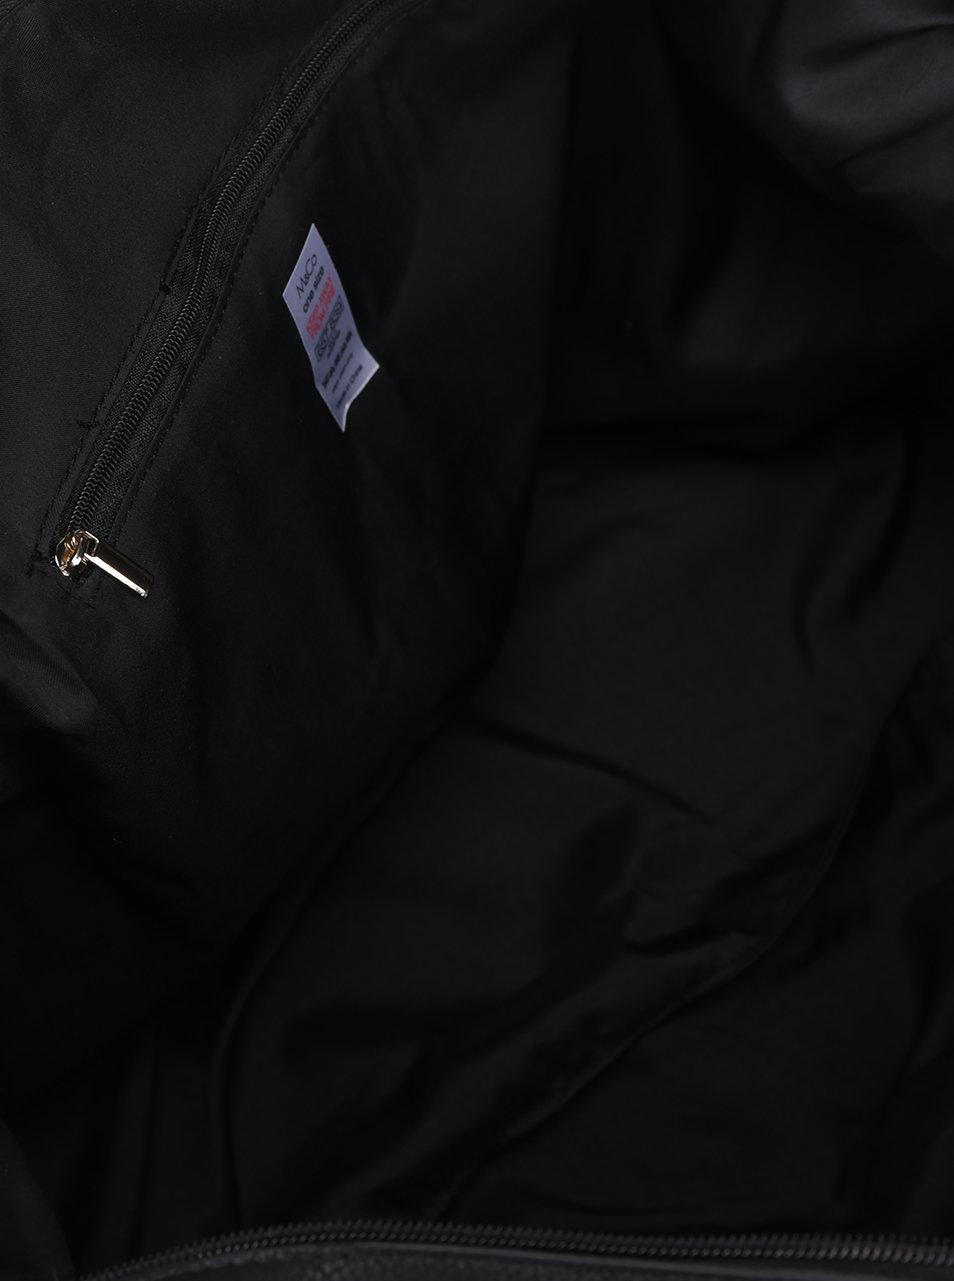 Čierno-béžová veľká kabelka do ruky M Co ... 807c35c4f0